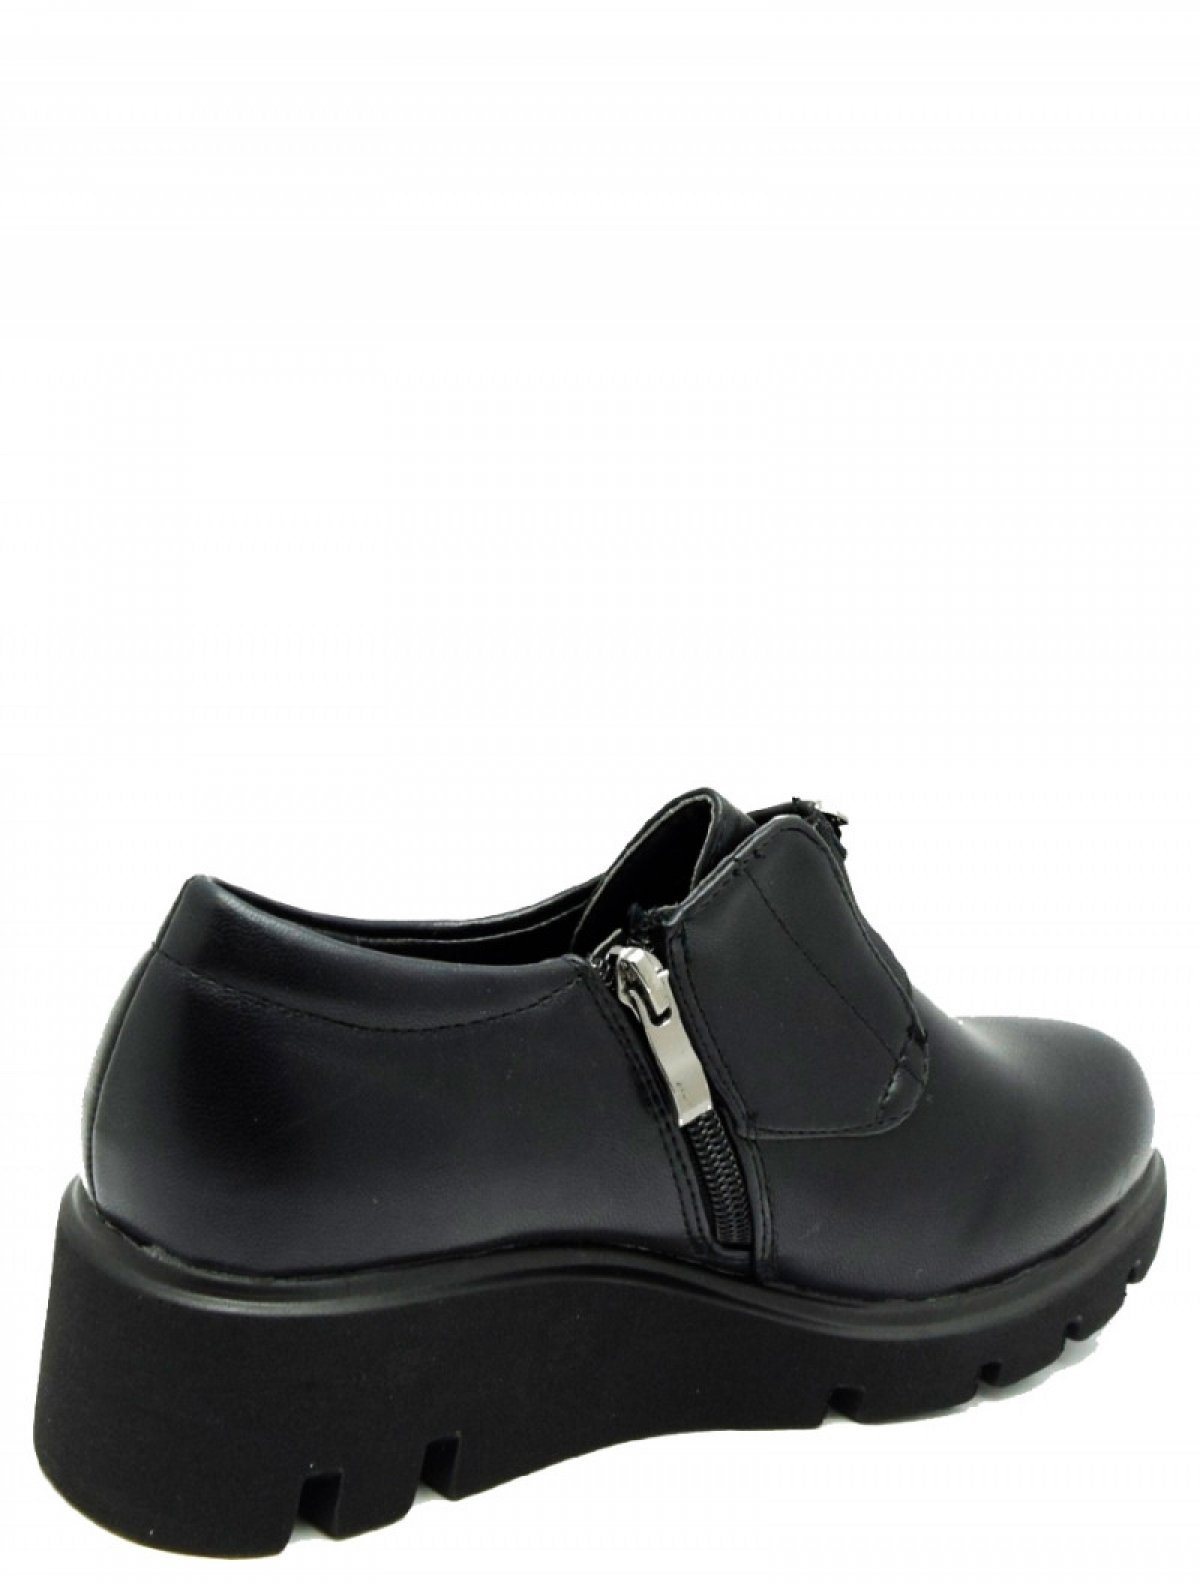 Admlis F8119 женские туфли